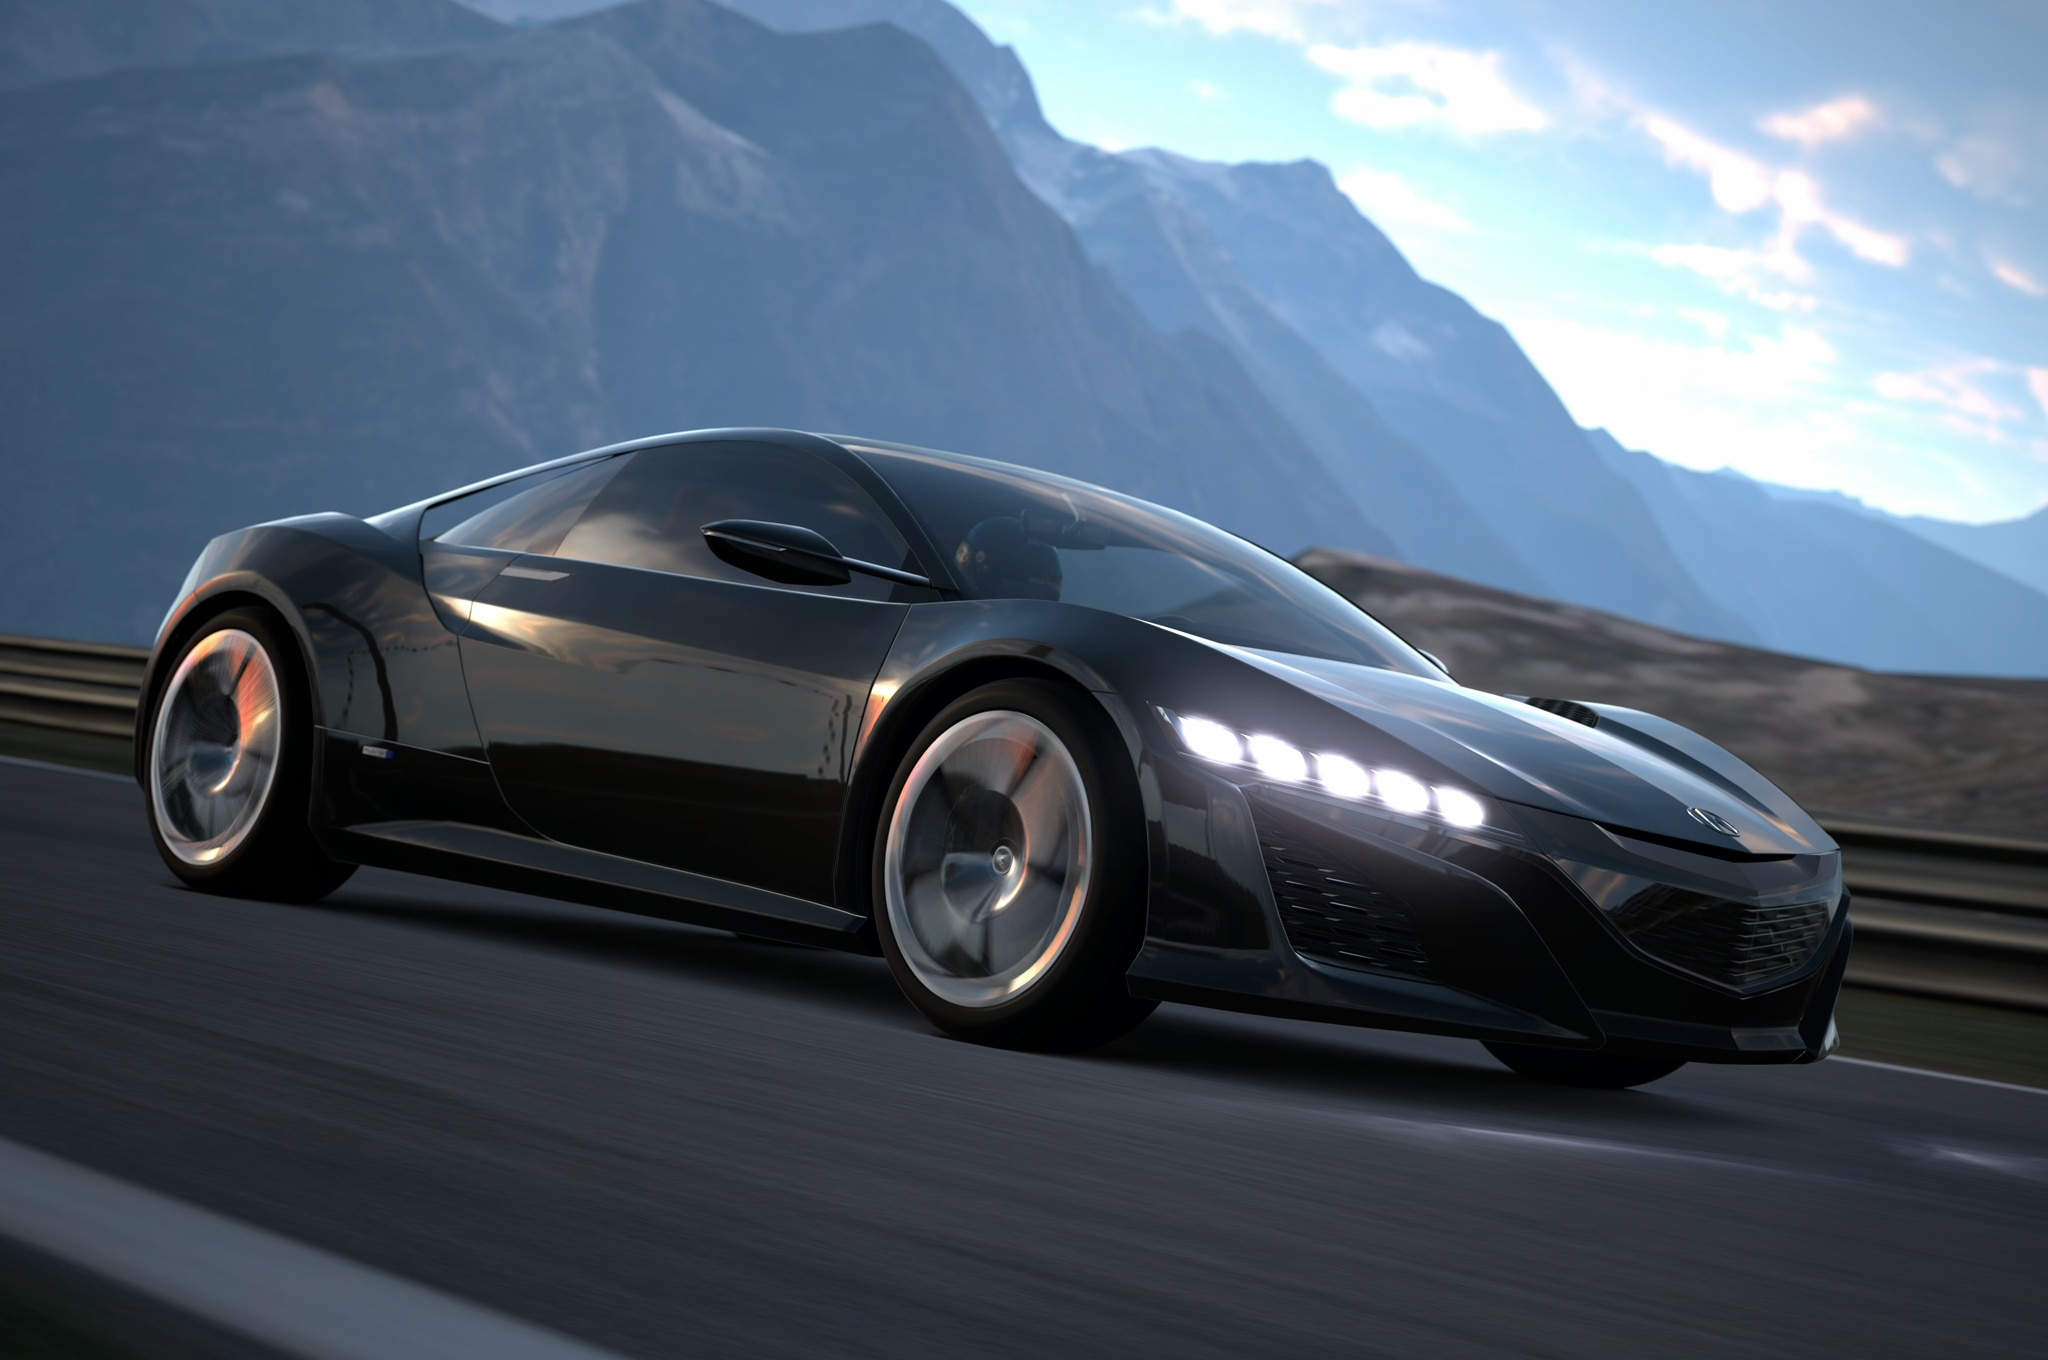 Acura Nsx Concept Gt6 Front Three Quarter1